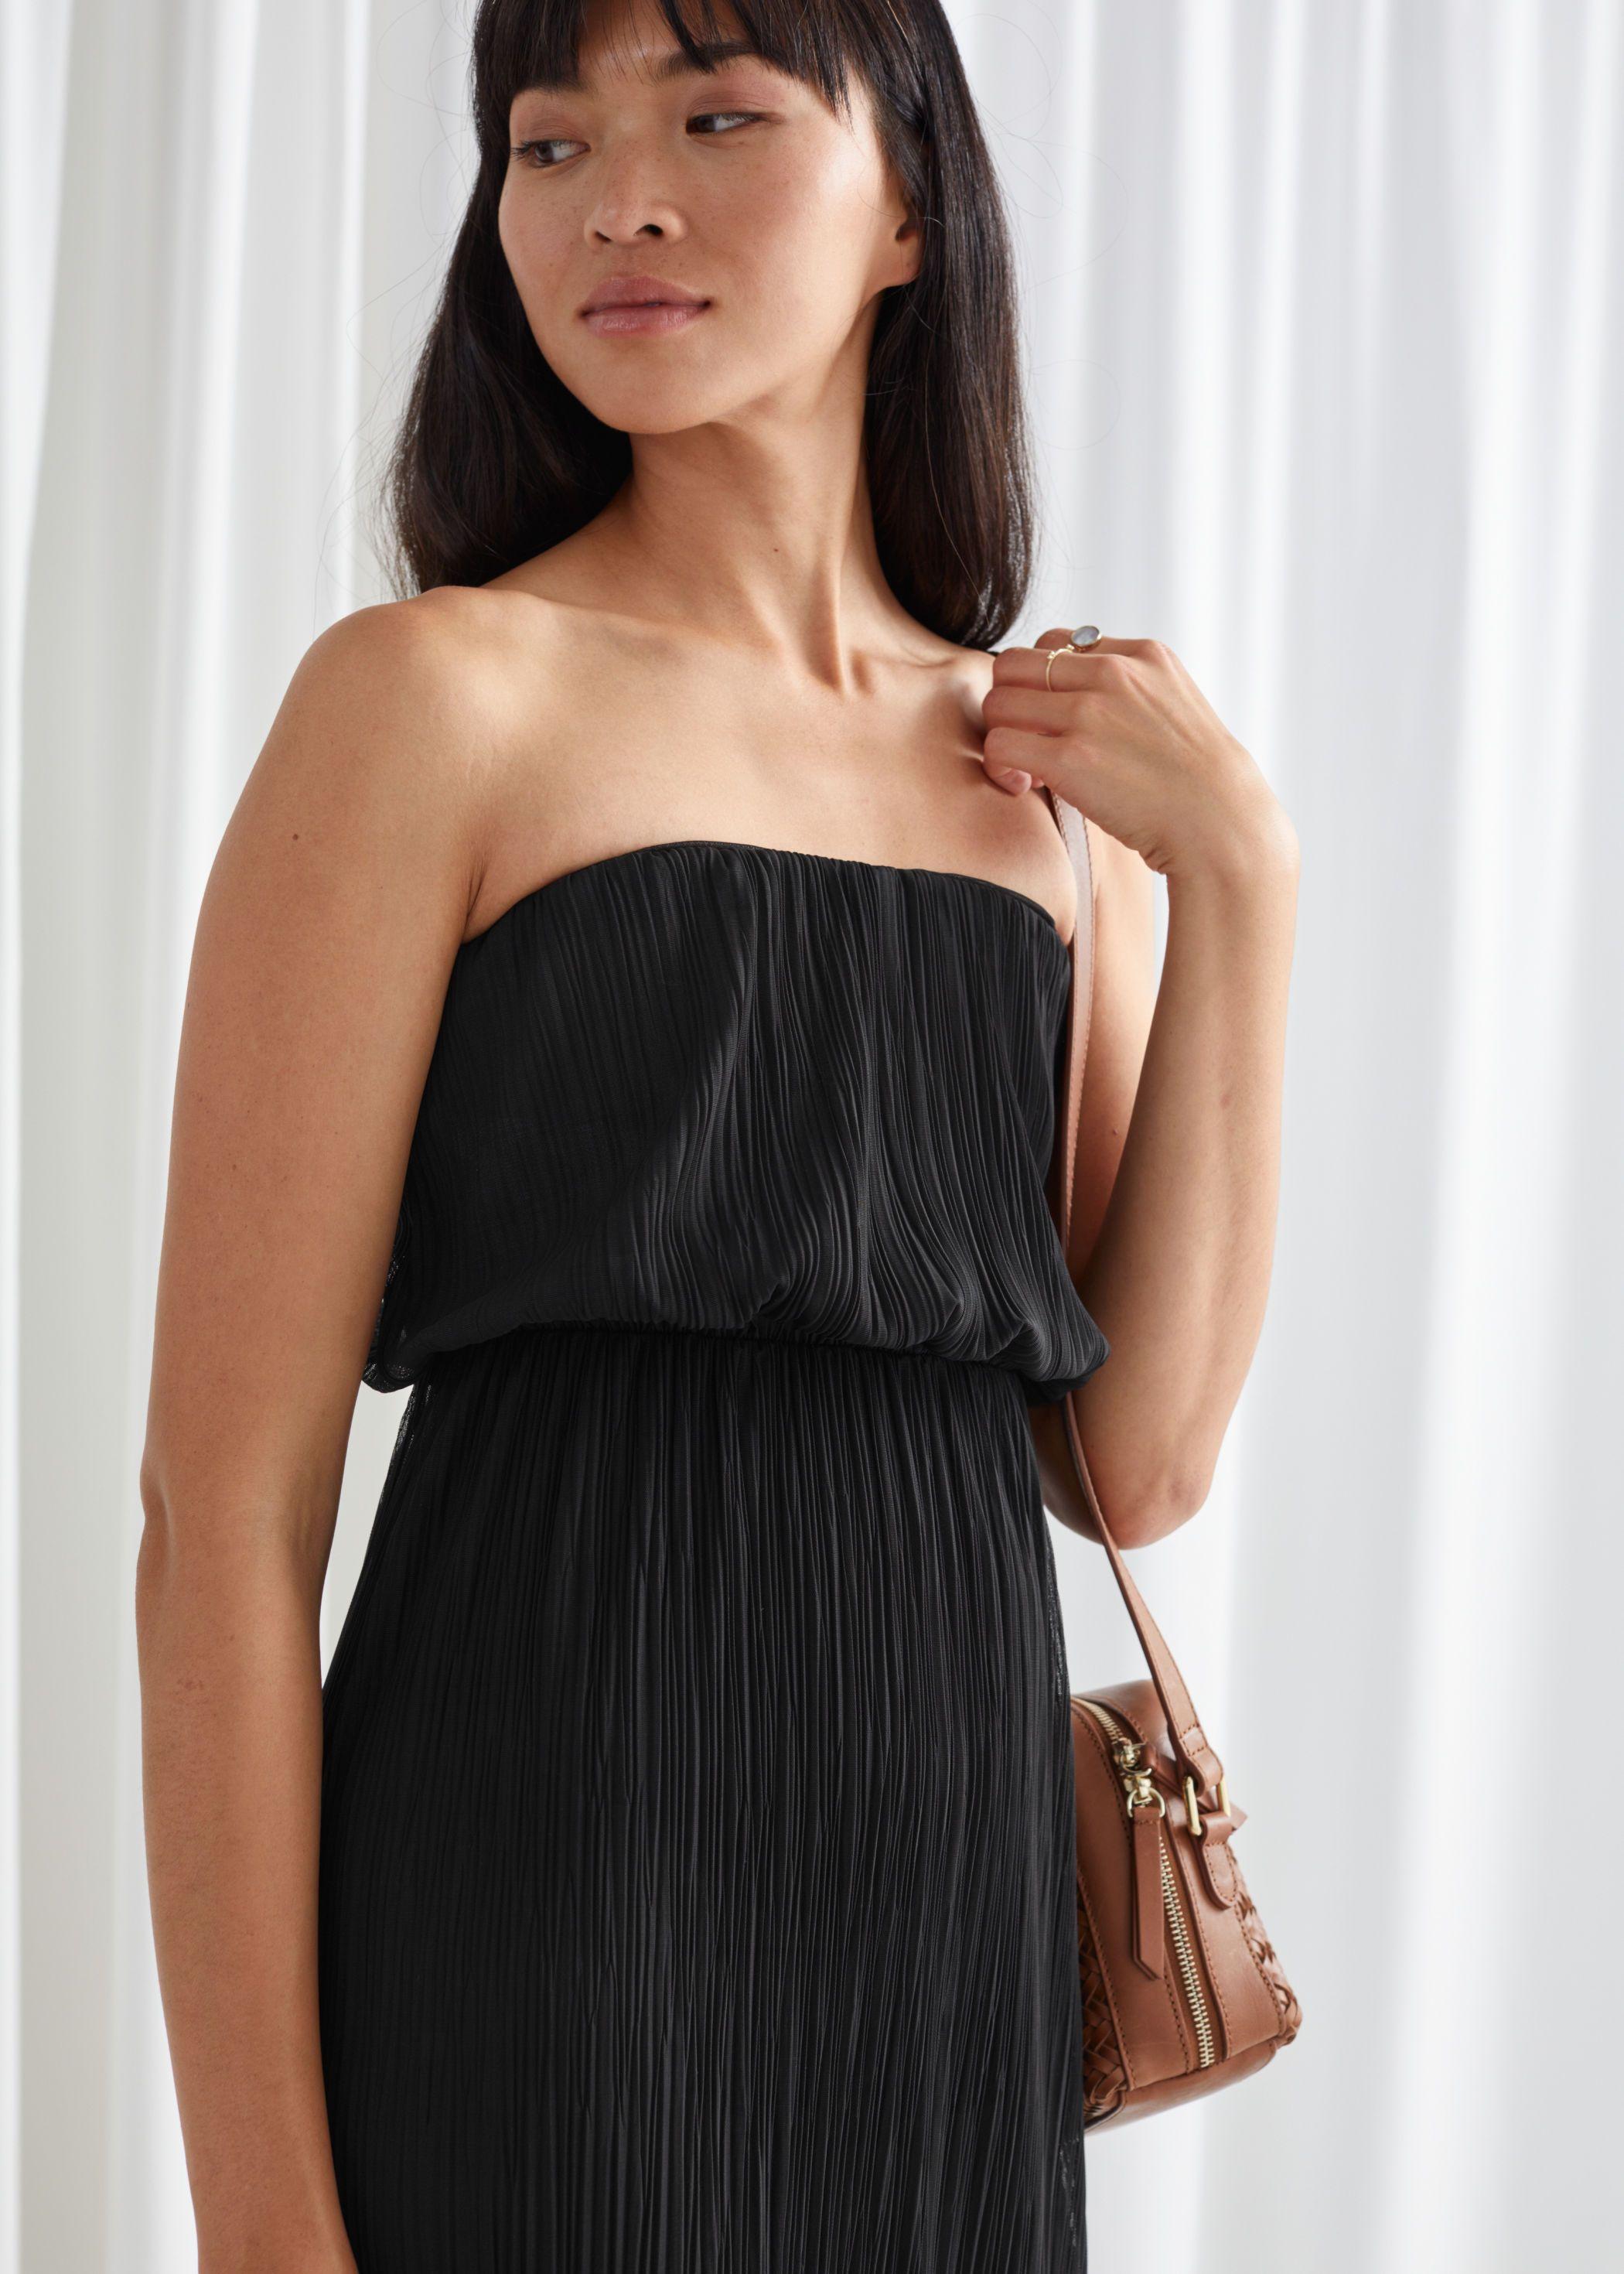 Strapless Fitted Midi Dress Fitted Midi Dress Midi Dress Dresses [ 2940 x 2100 Pixel ]